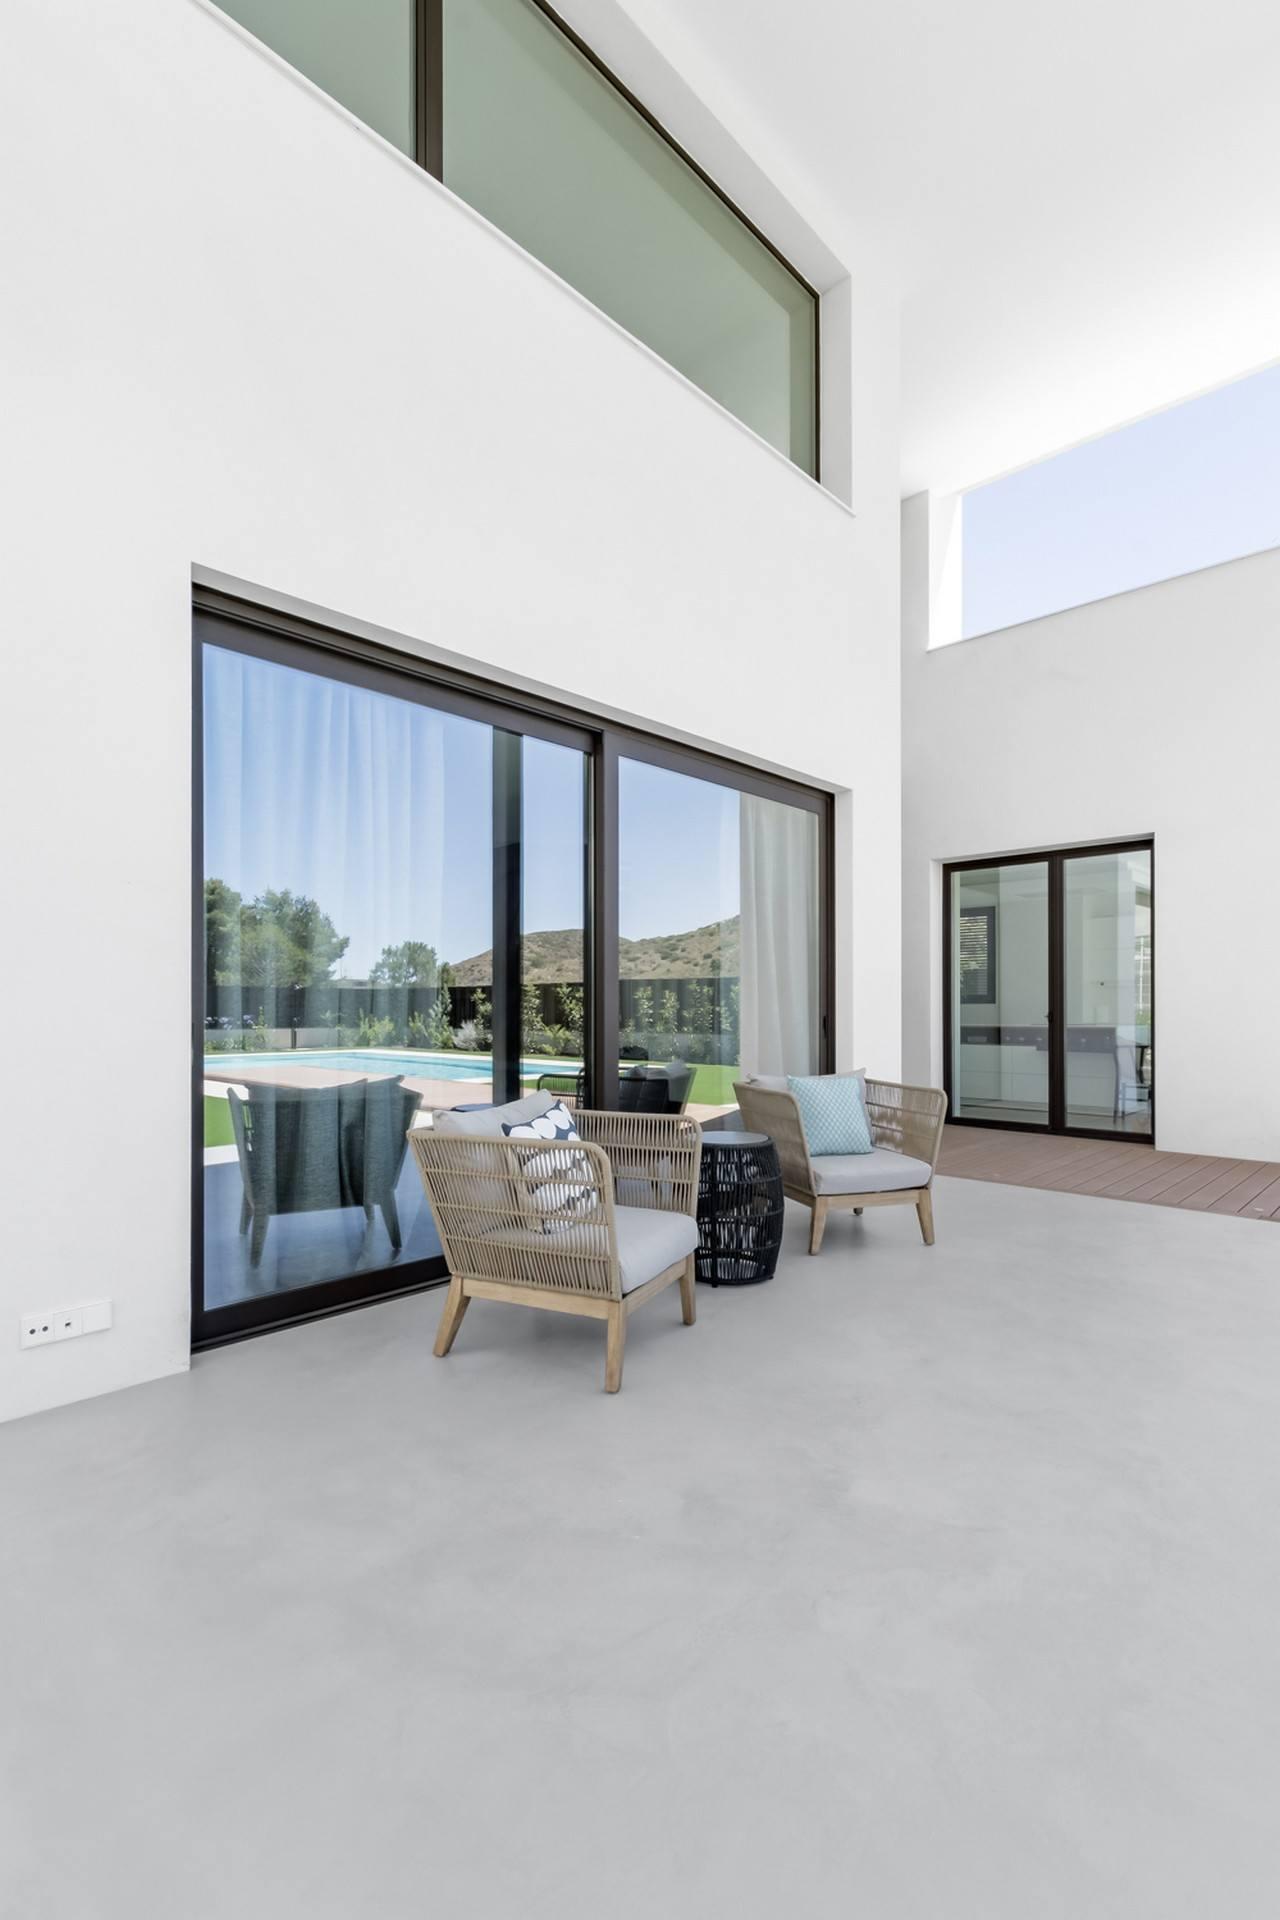 Microcemento para exteriores revestimientos de exterior - Microcemento para exteriores ...